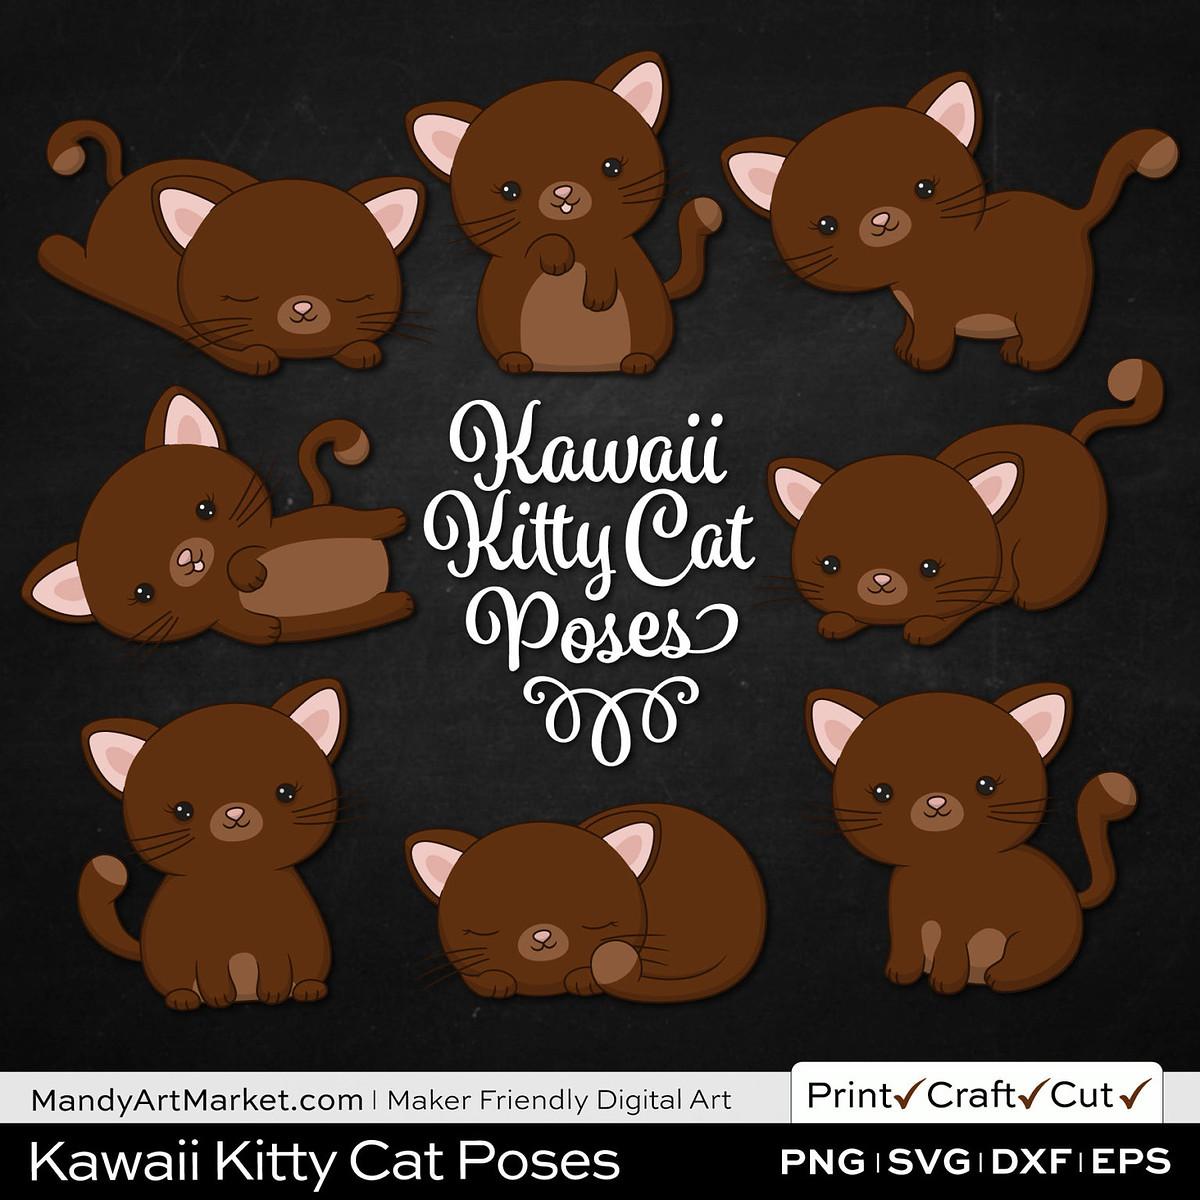 Dark Pecan Brown Kawaii Kitty Cat Poses Clipart on Black Background